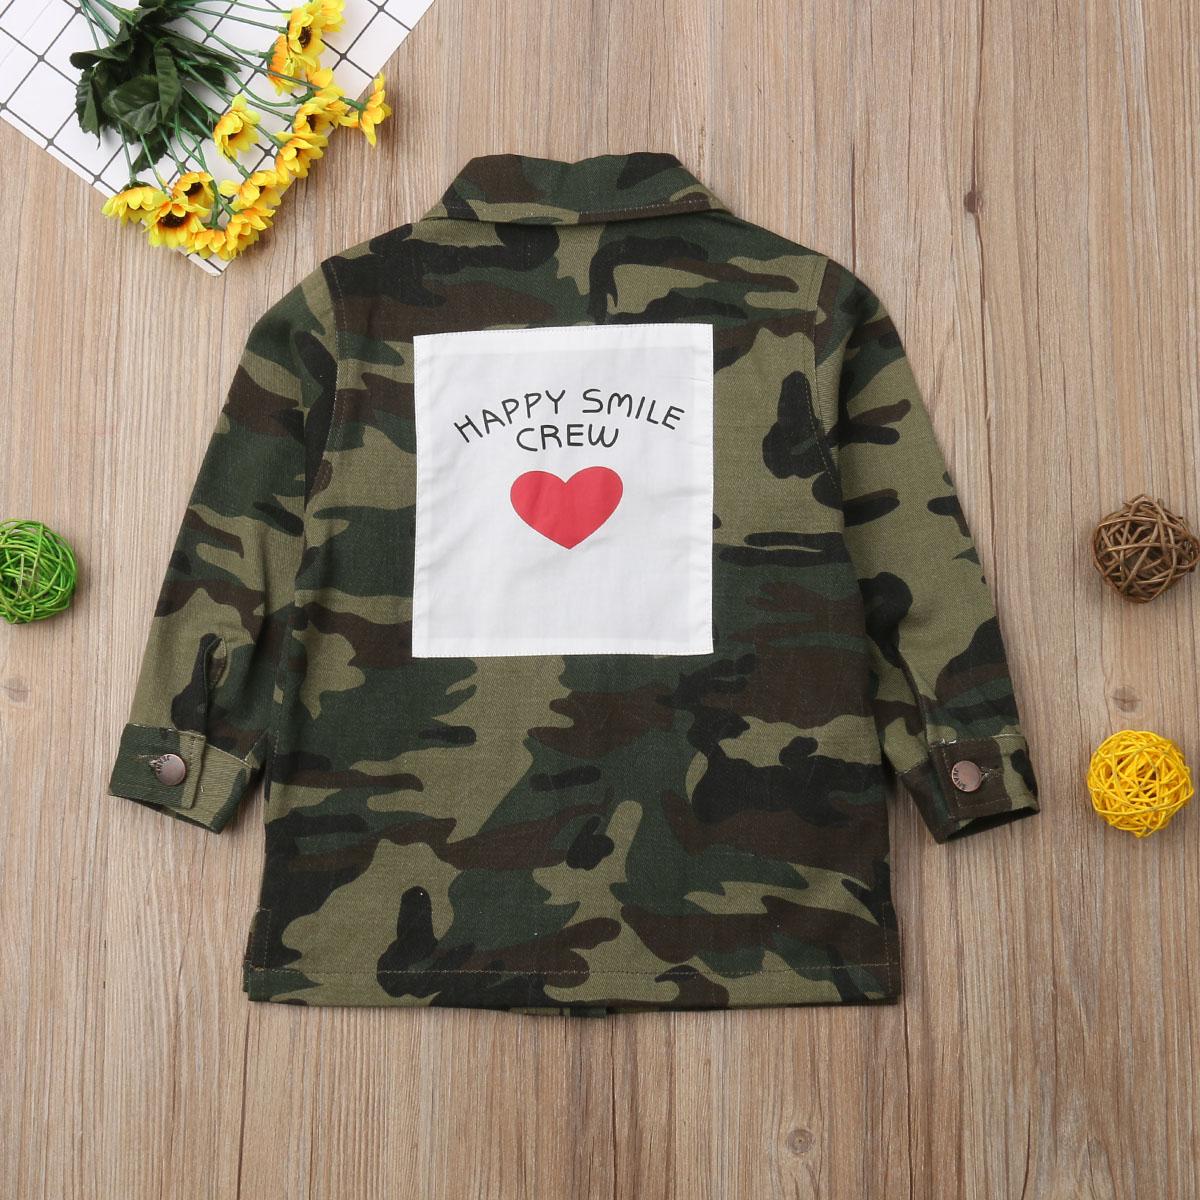 0aa6b93c784c8 2019 Spring Fashion Kids Boy Girl Camo Long Sleeve Jacket Spring Coat  Outerwear Clothes Autumn Valentine